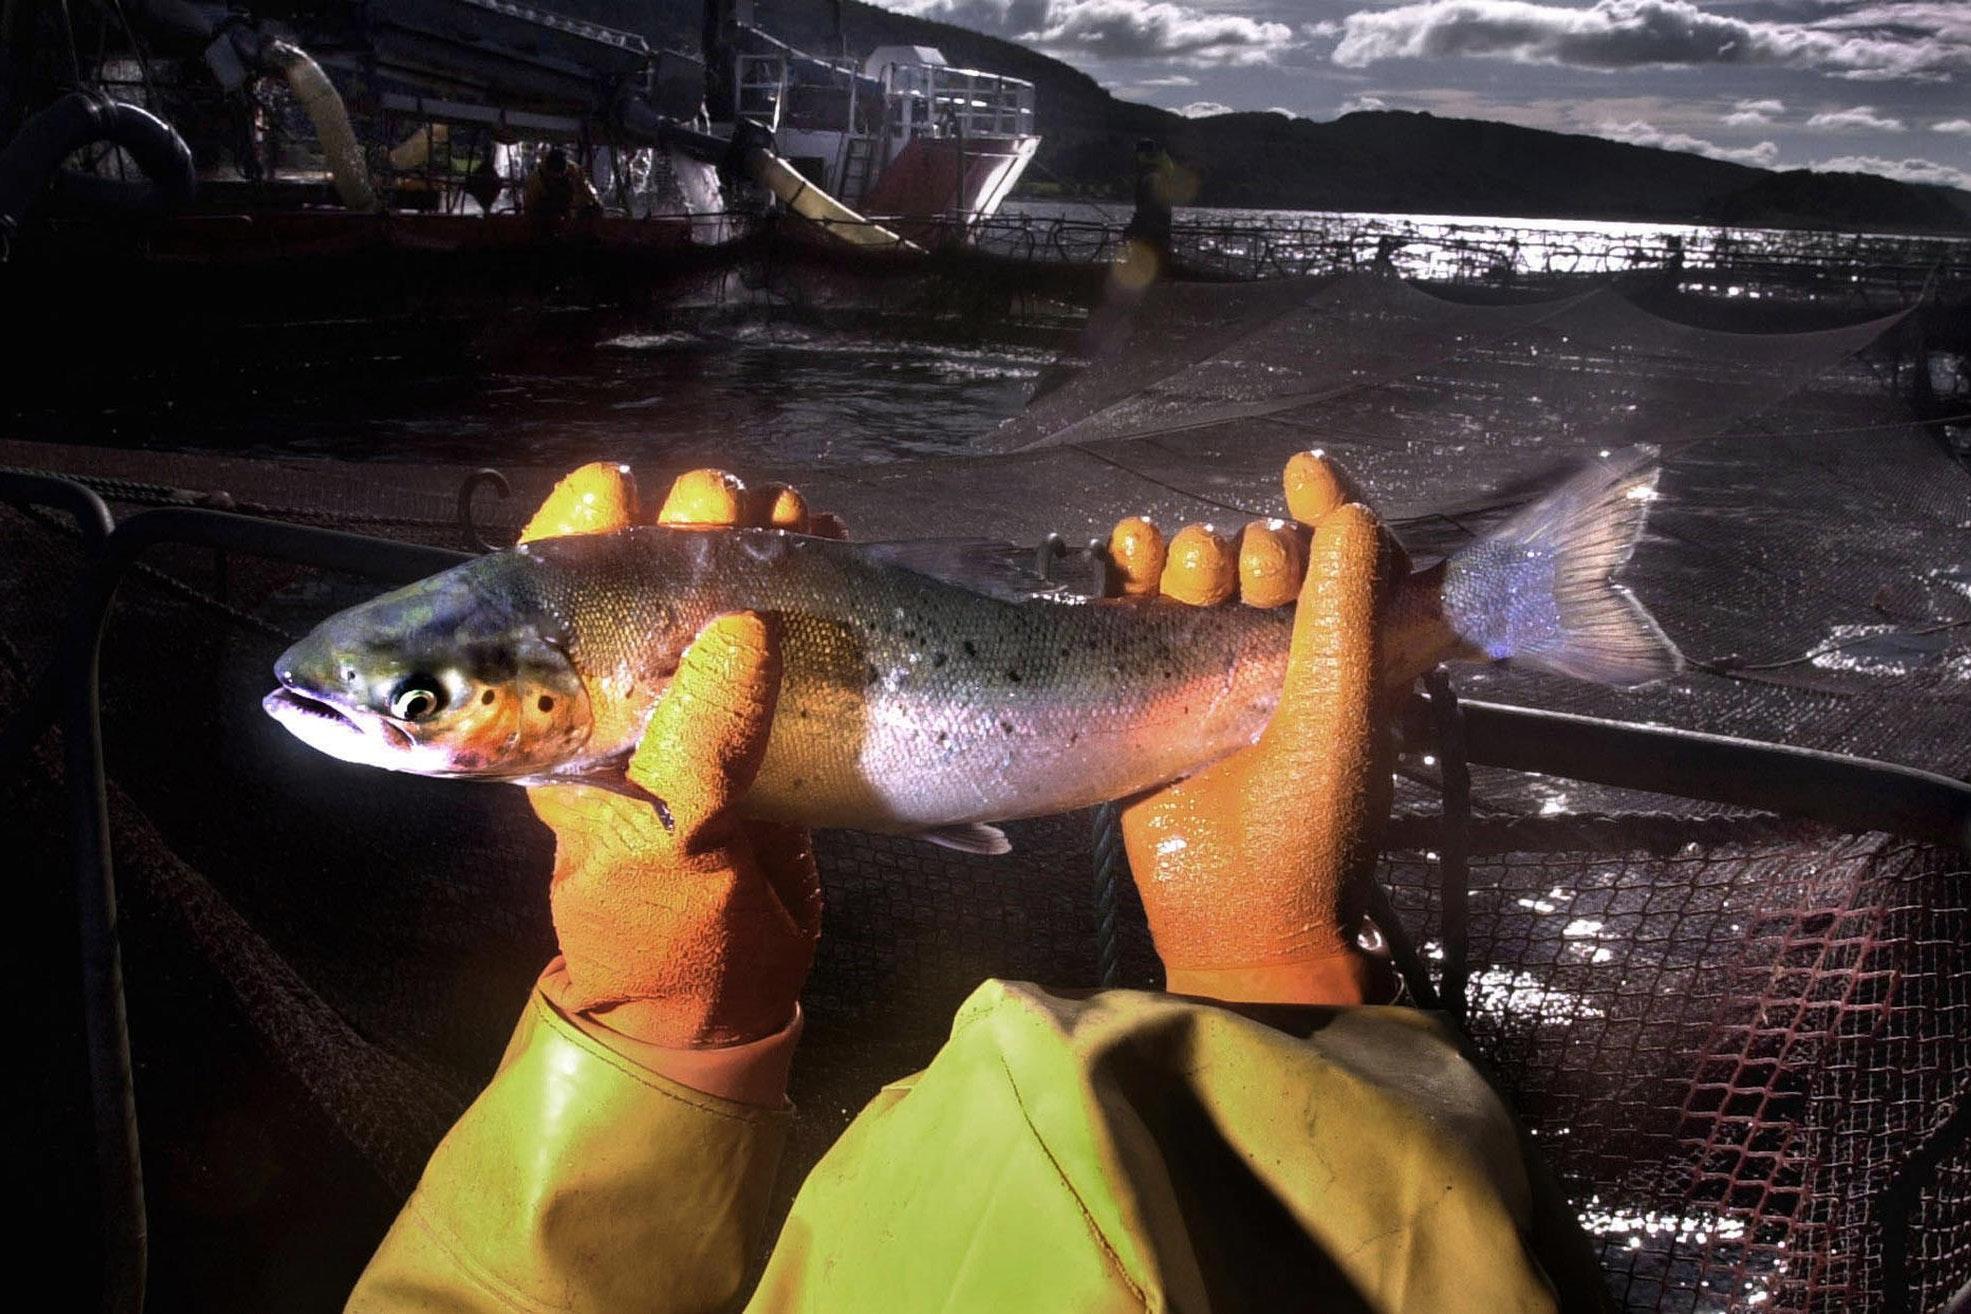 Salmon farm medicine having significant environmental impact, study finds